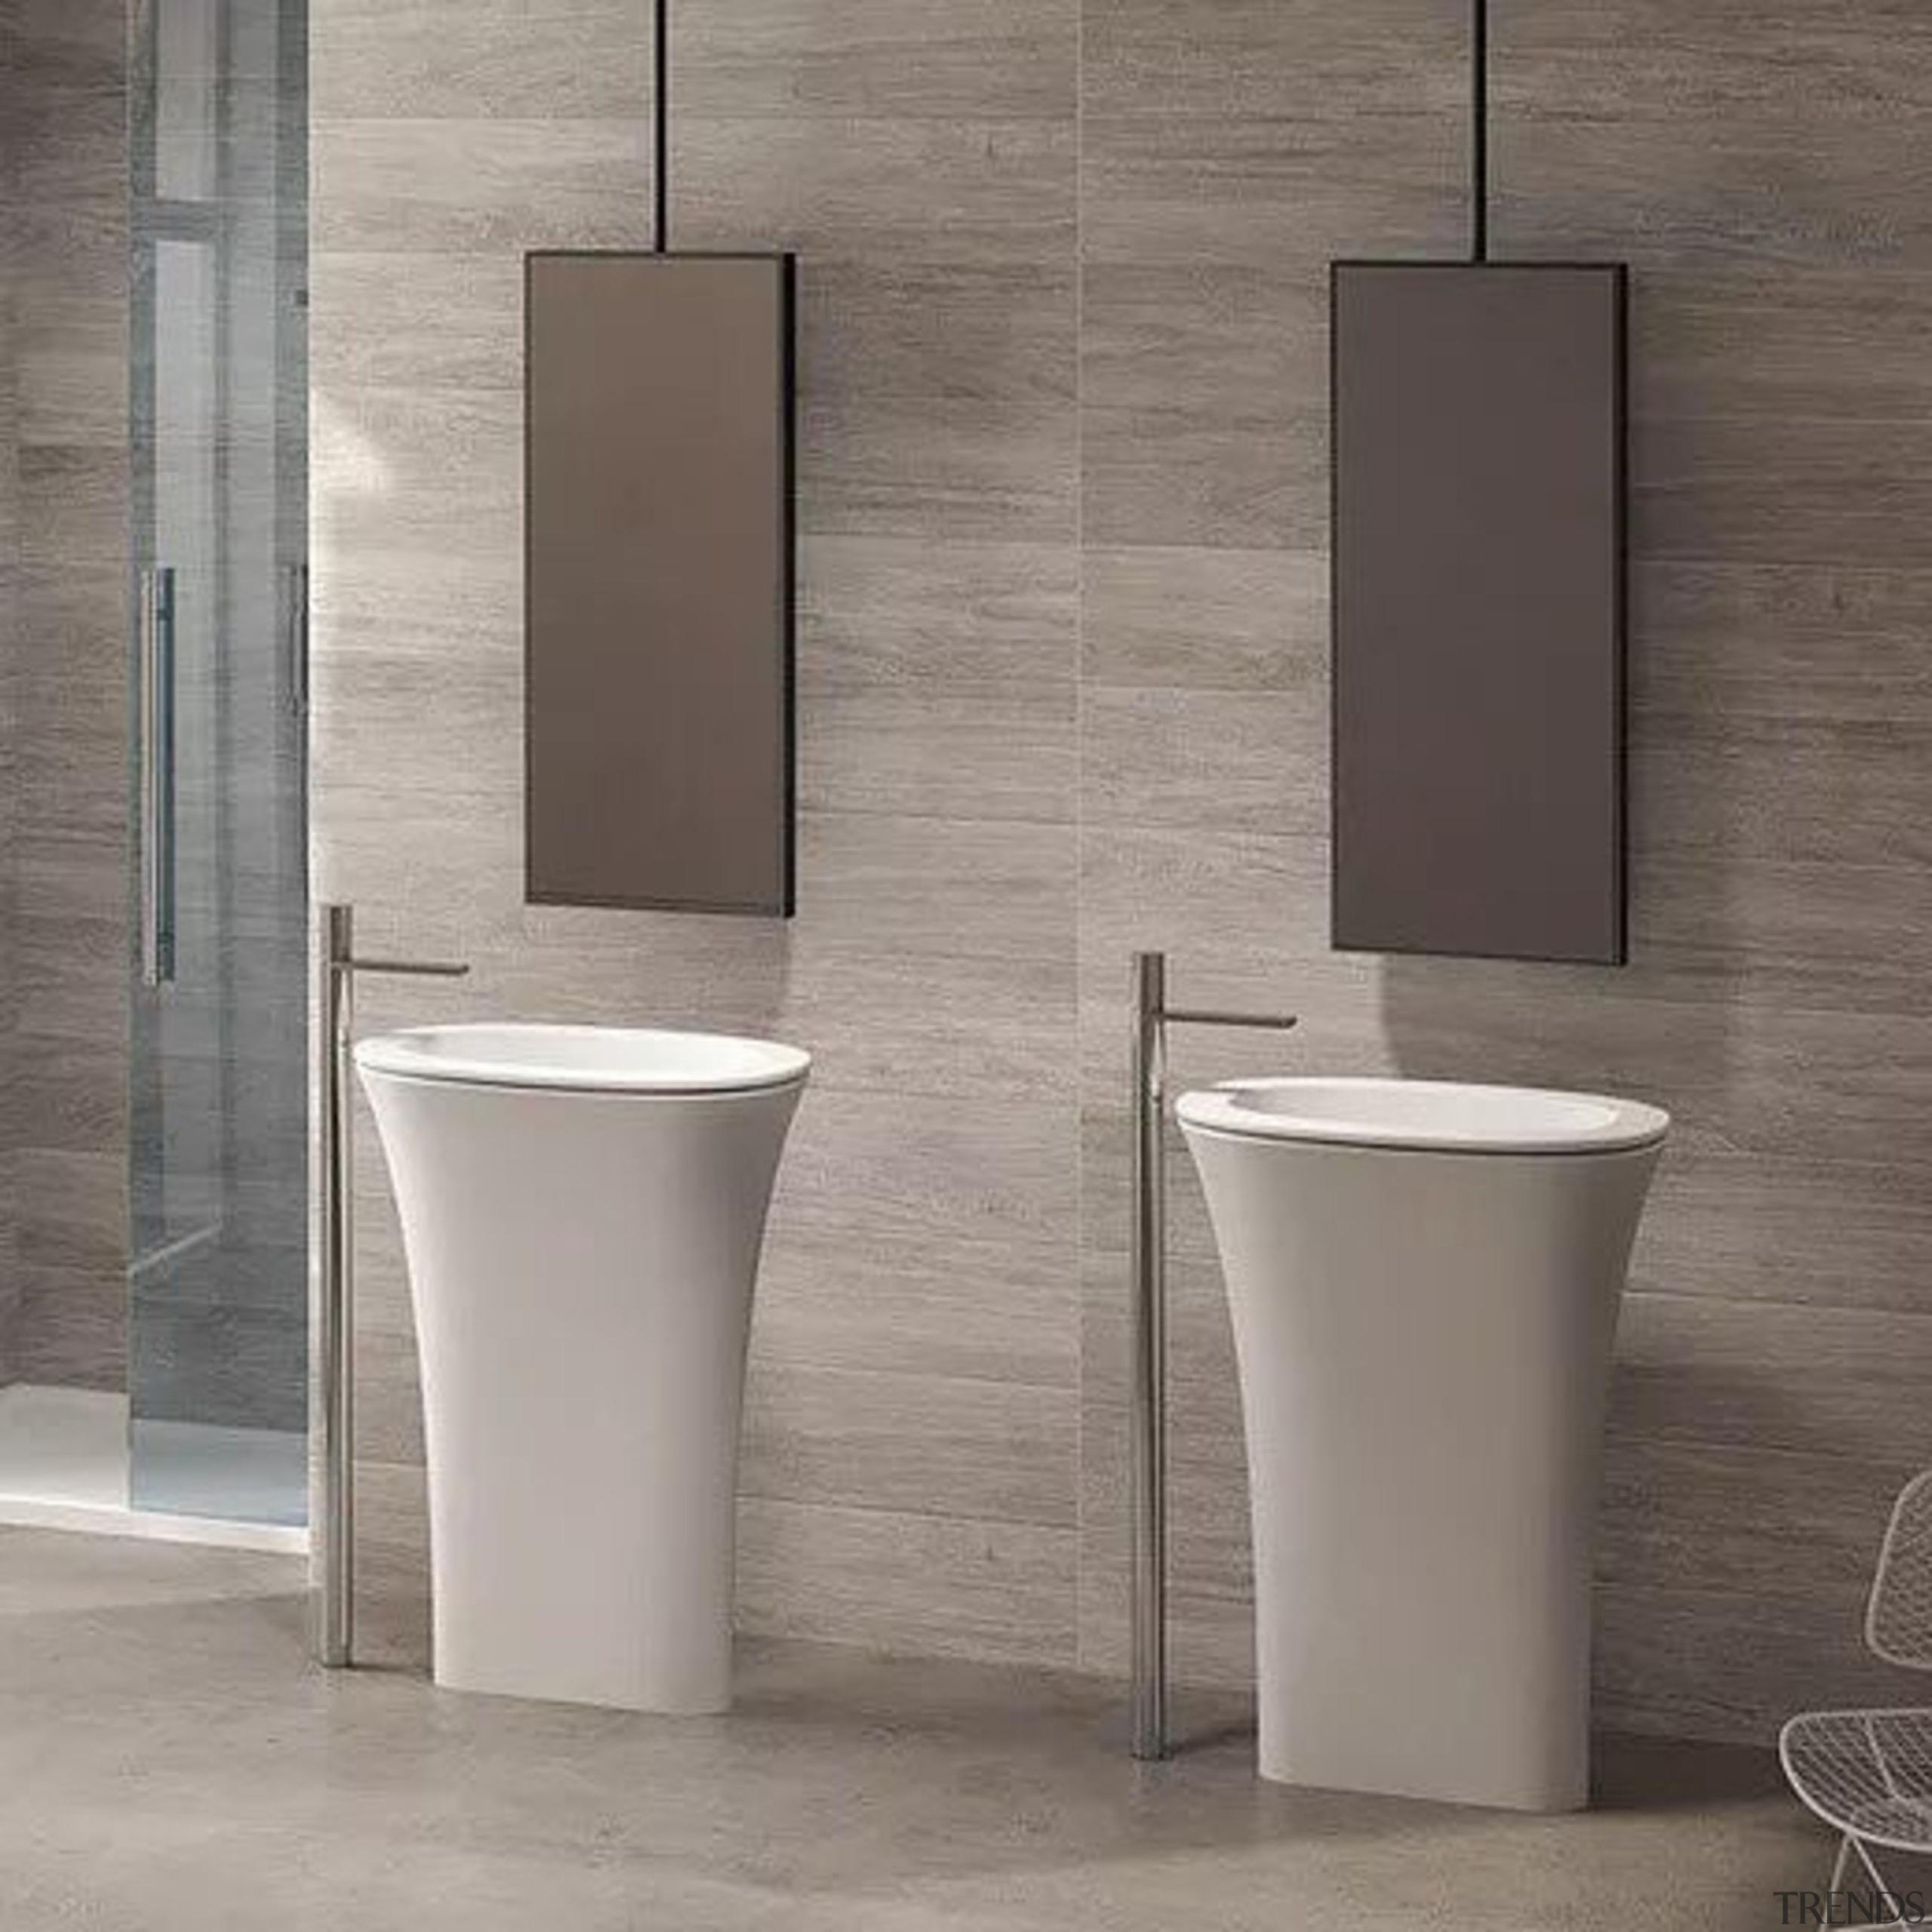 Karim - bathroom   bidet   ceramic   bathroom, bidet, ceramic, floor, plumbing fixture, product design, sink, tap, toilet, gray